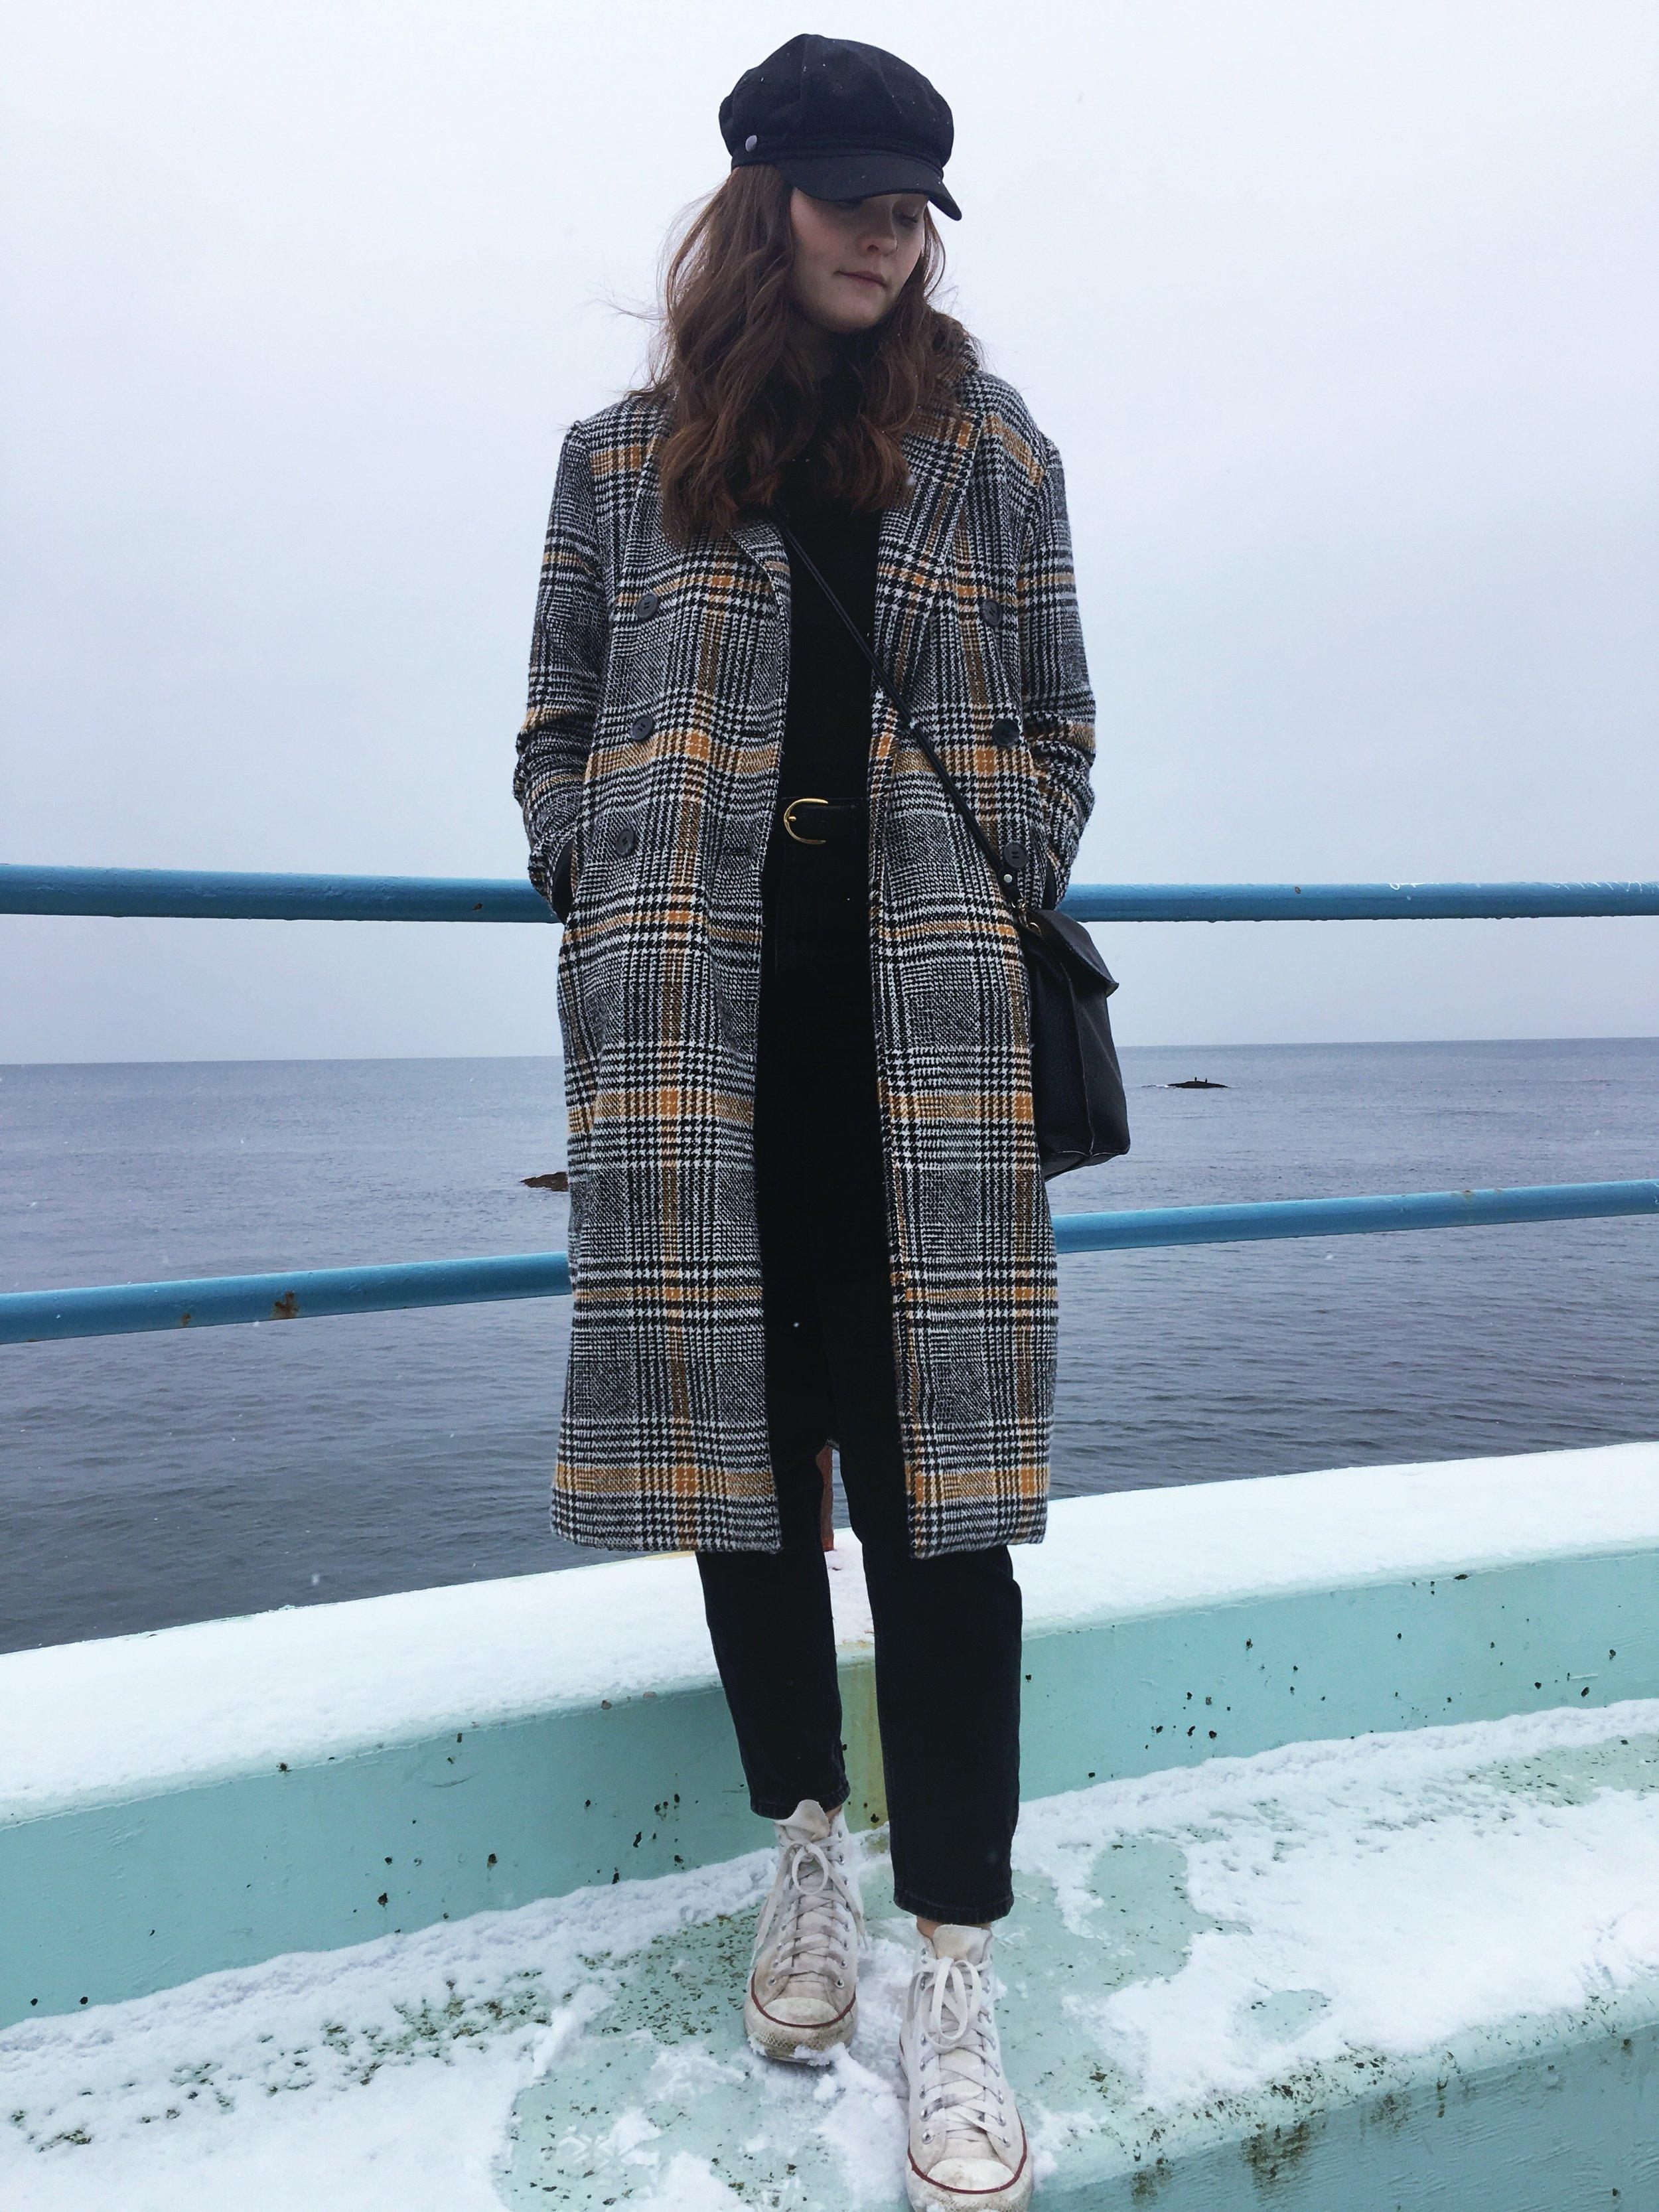 confidence | self image | Canadian lifestyle blogger | freelance writer | post graduate | The States of Georgia blog | writing and lifestyle blog